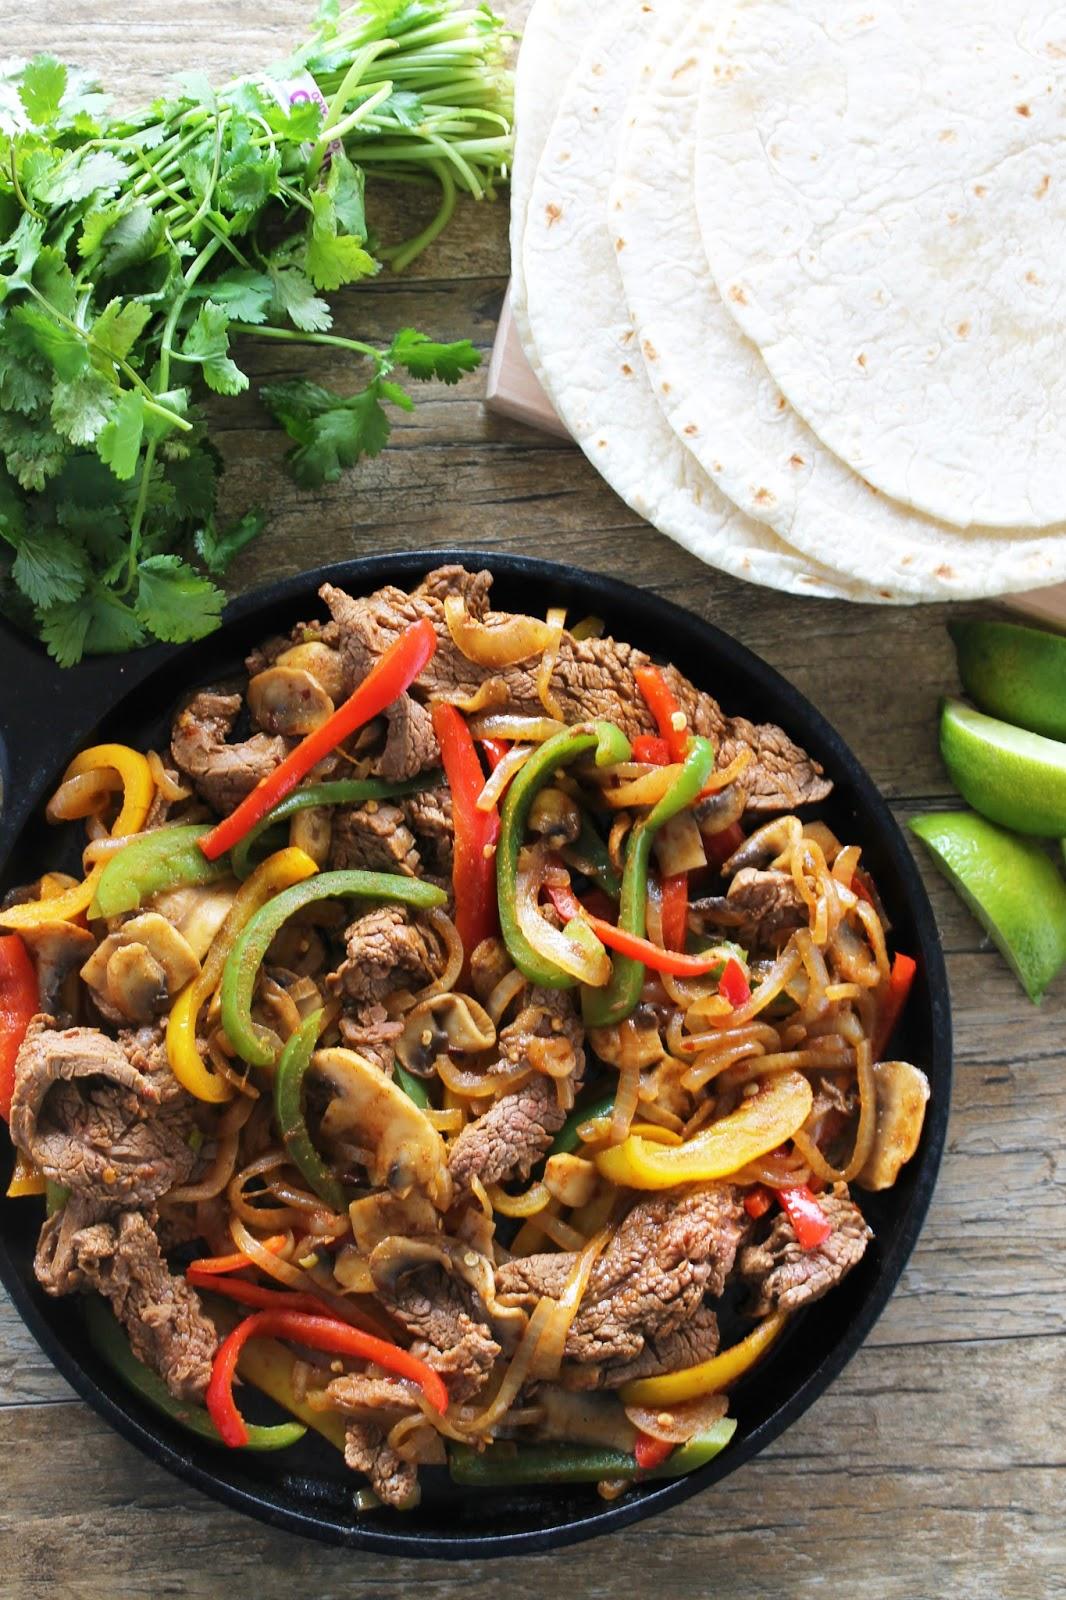 How to cook beef flank steak for fajitas